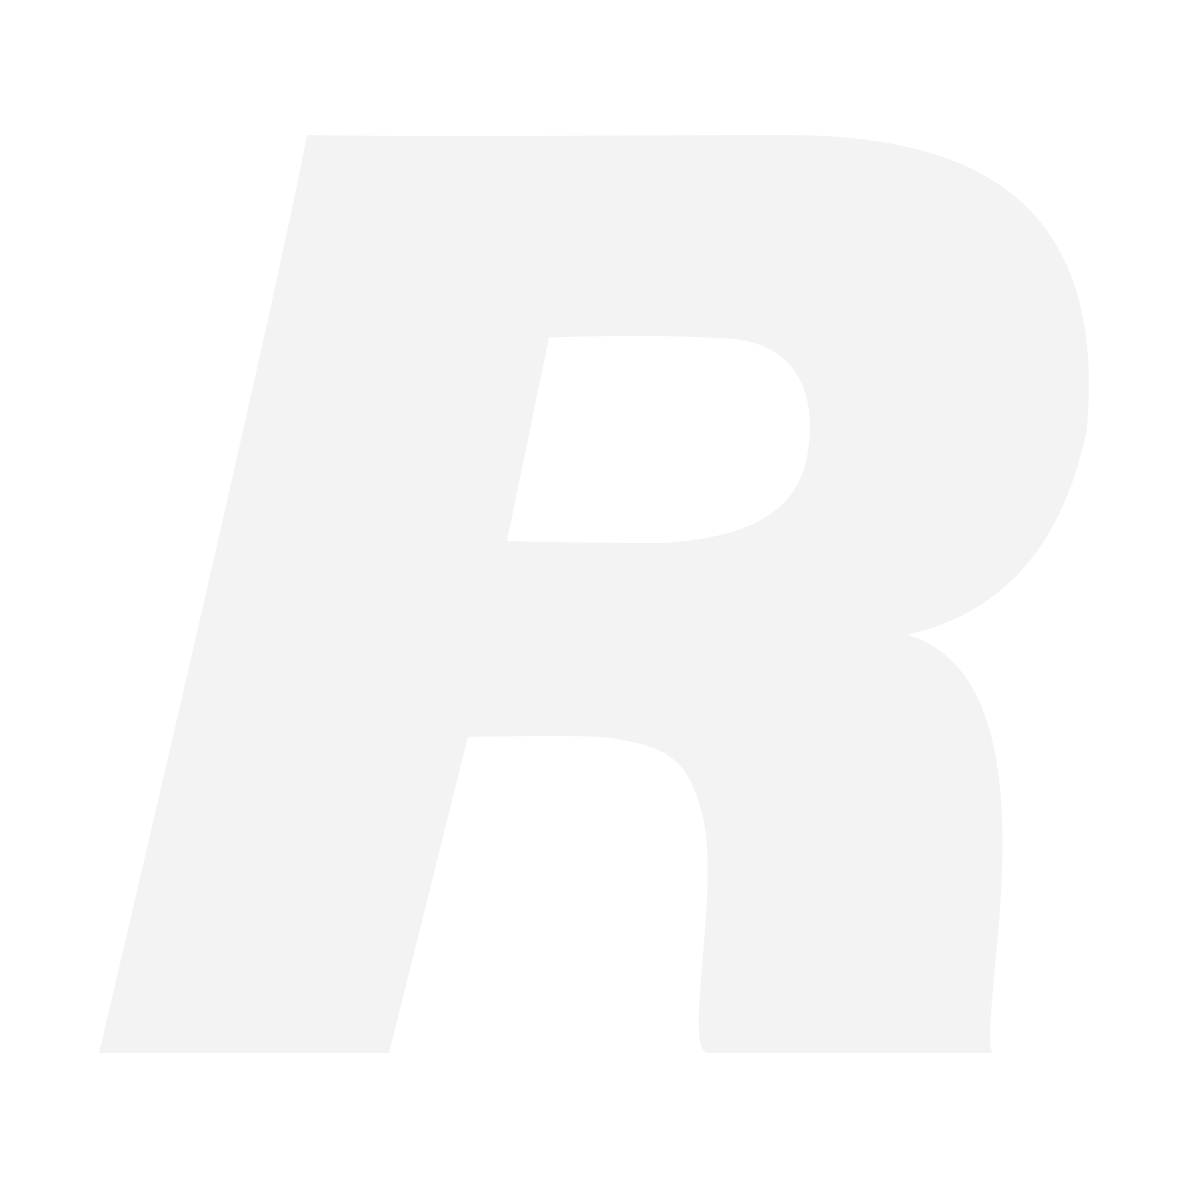 Leica Rangemaster 1000 CRF